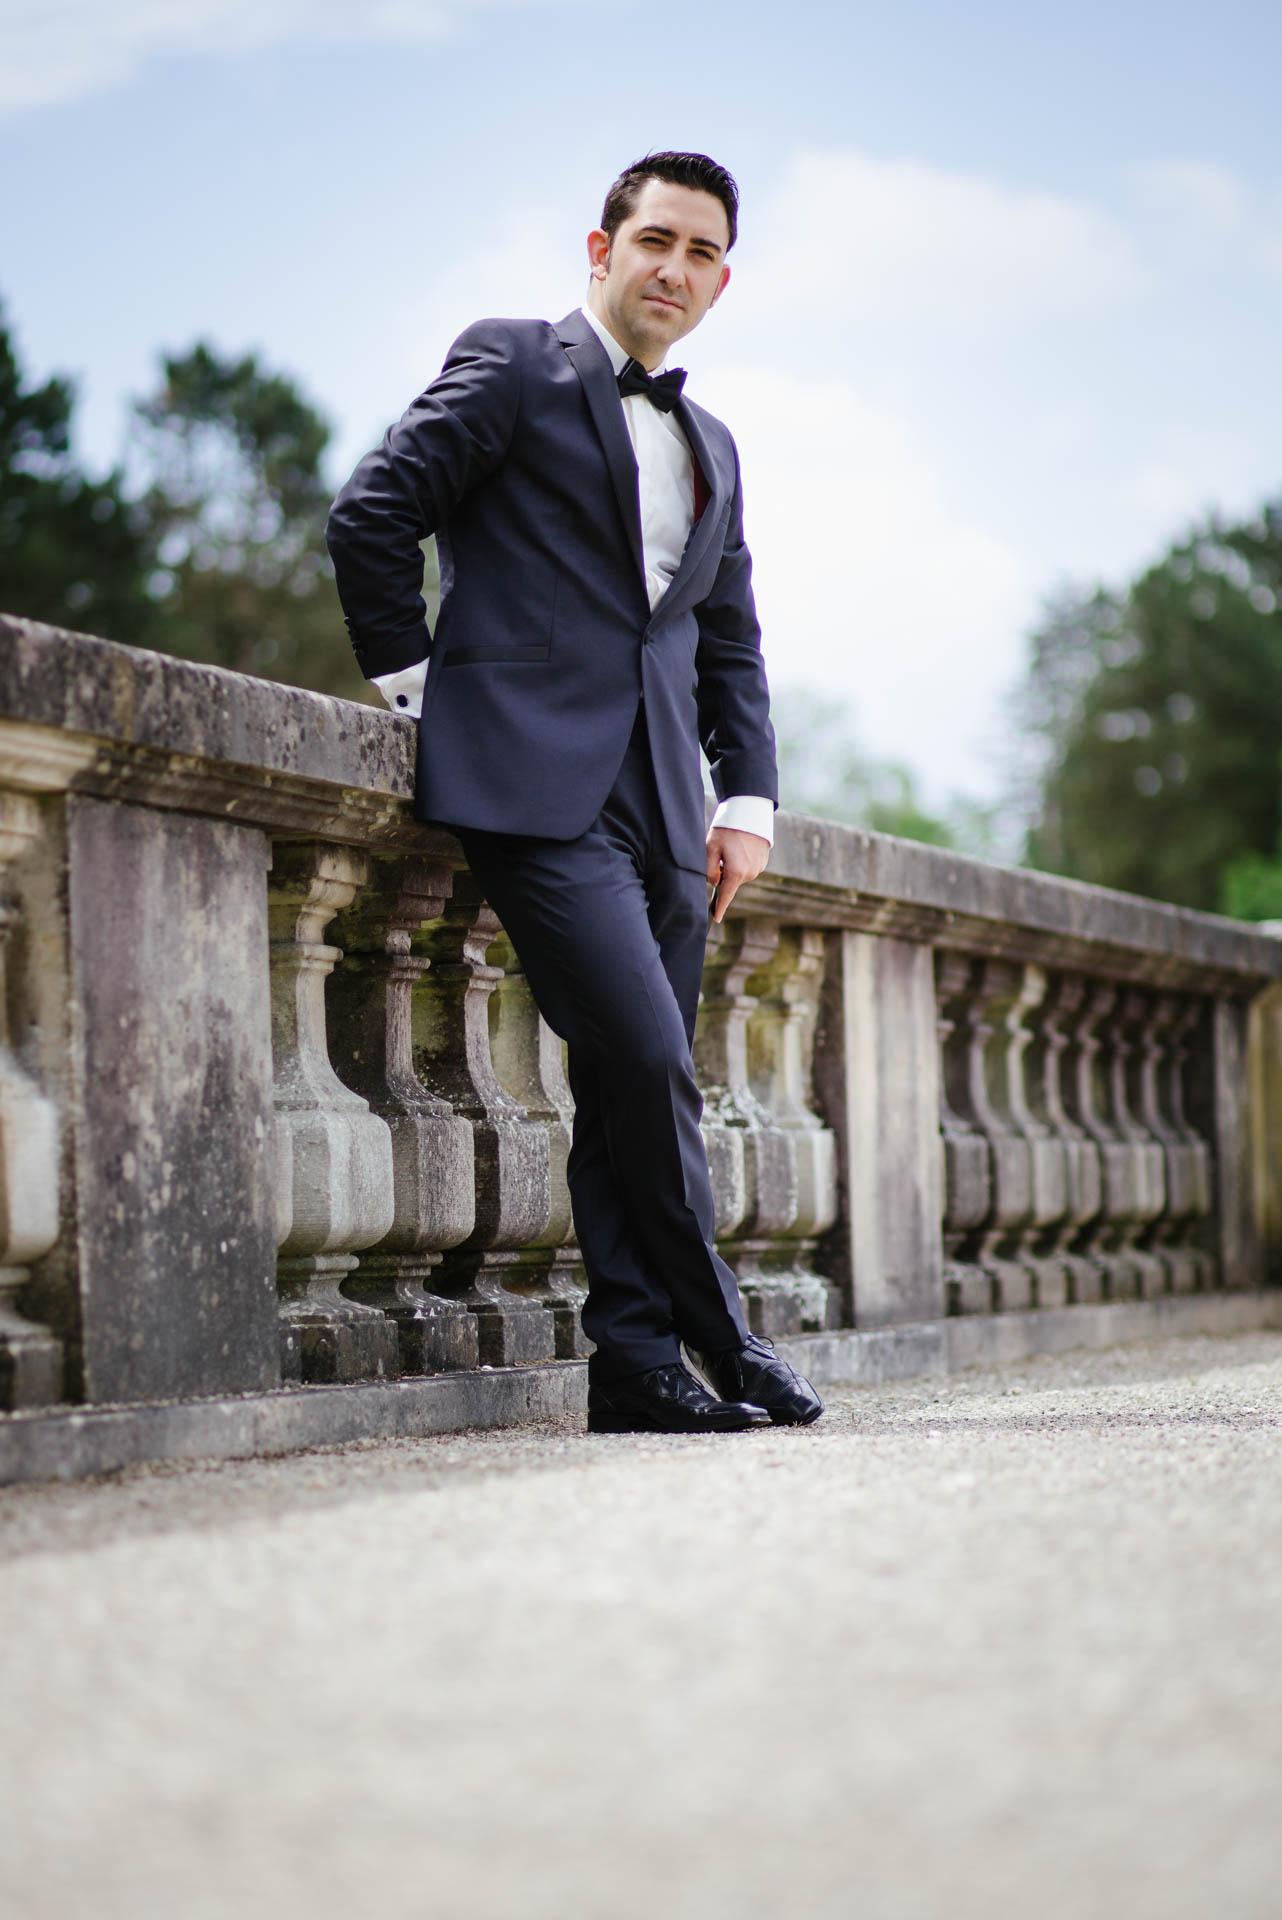 Dana_Michael_Hochzeit_Muttenz_2016-1